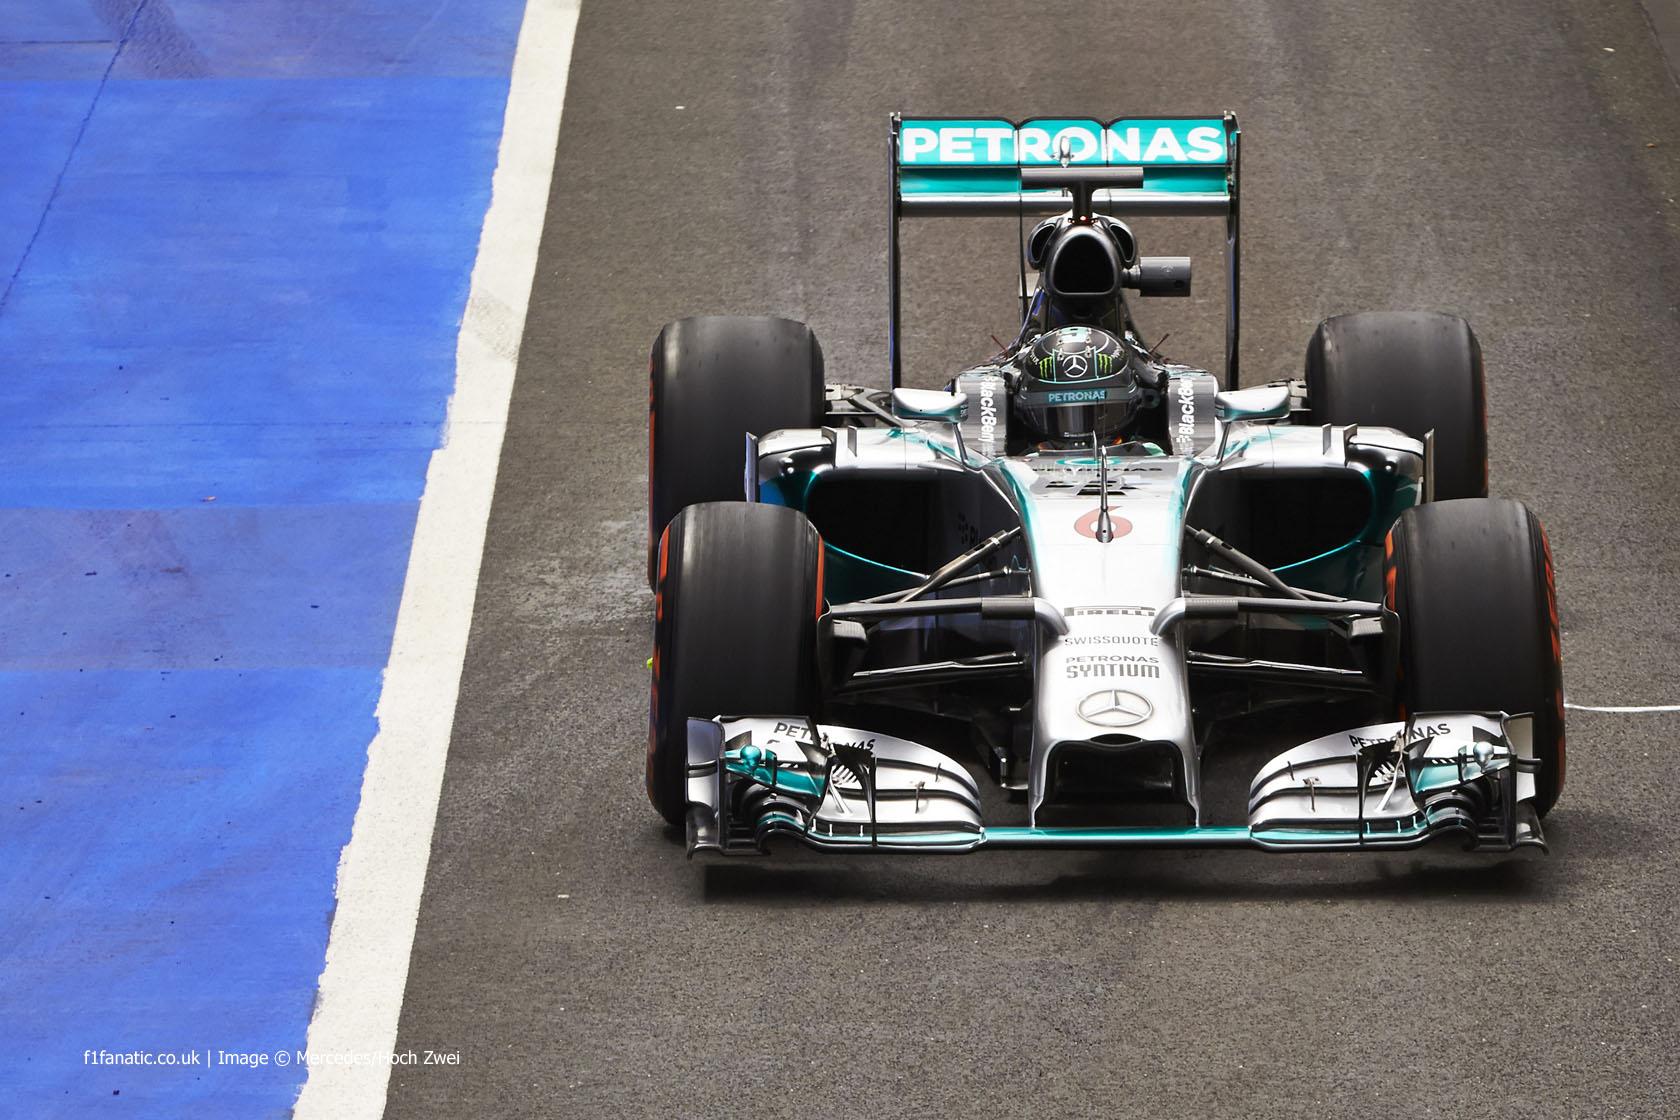 Nico Rosberg, Mercedes, Silverstone test, 2014